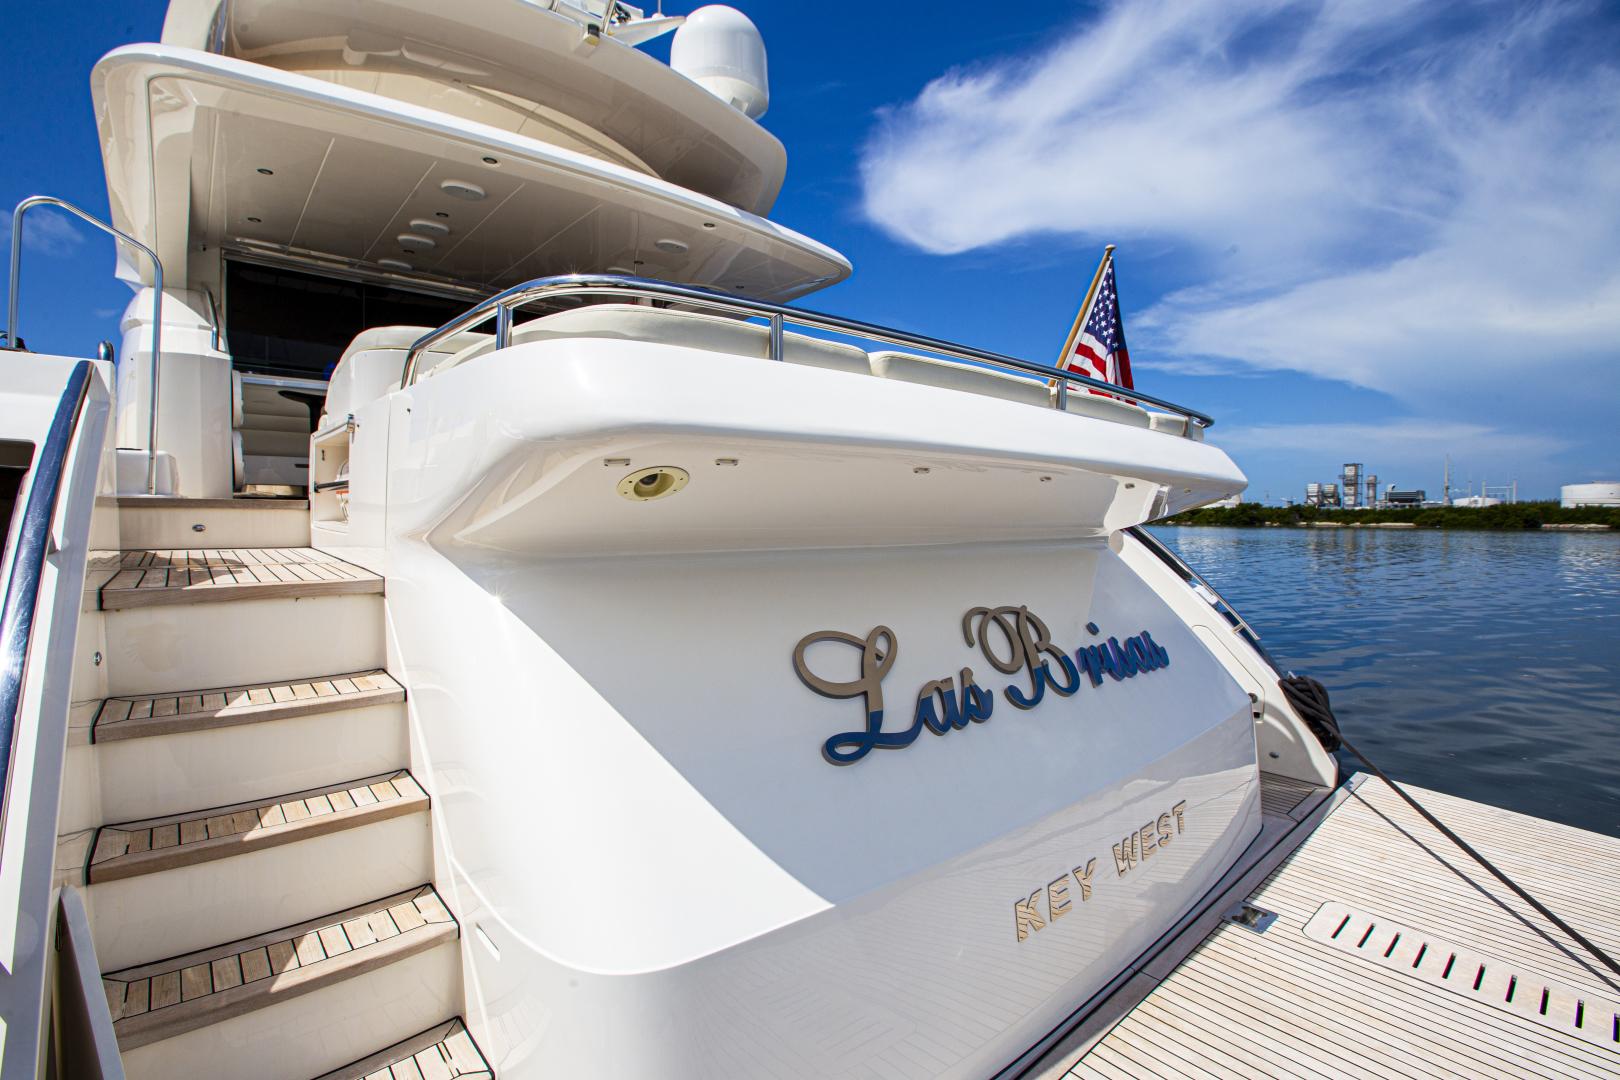 Viking Princess-V85 2009-Las Brisas Fort Lauderdale-Florida-United States-1365547 | Thumbnail